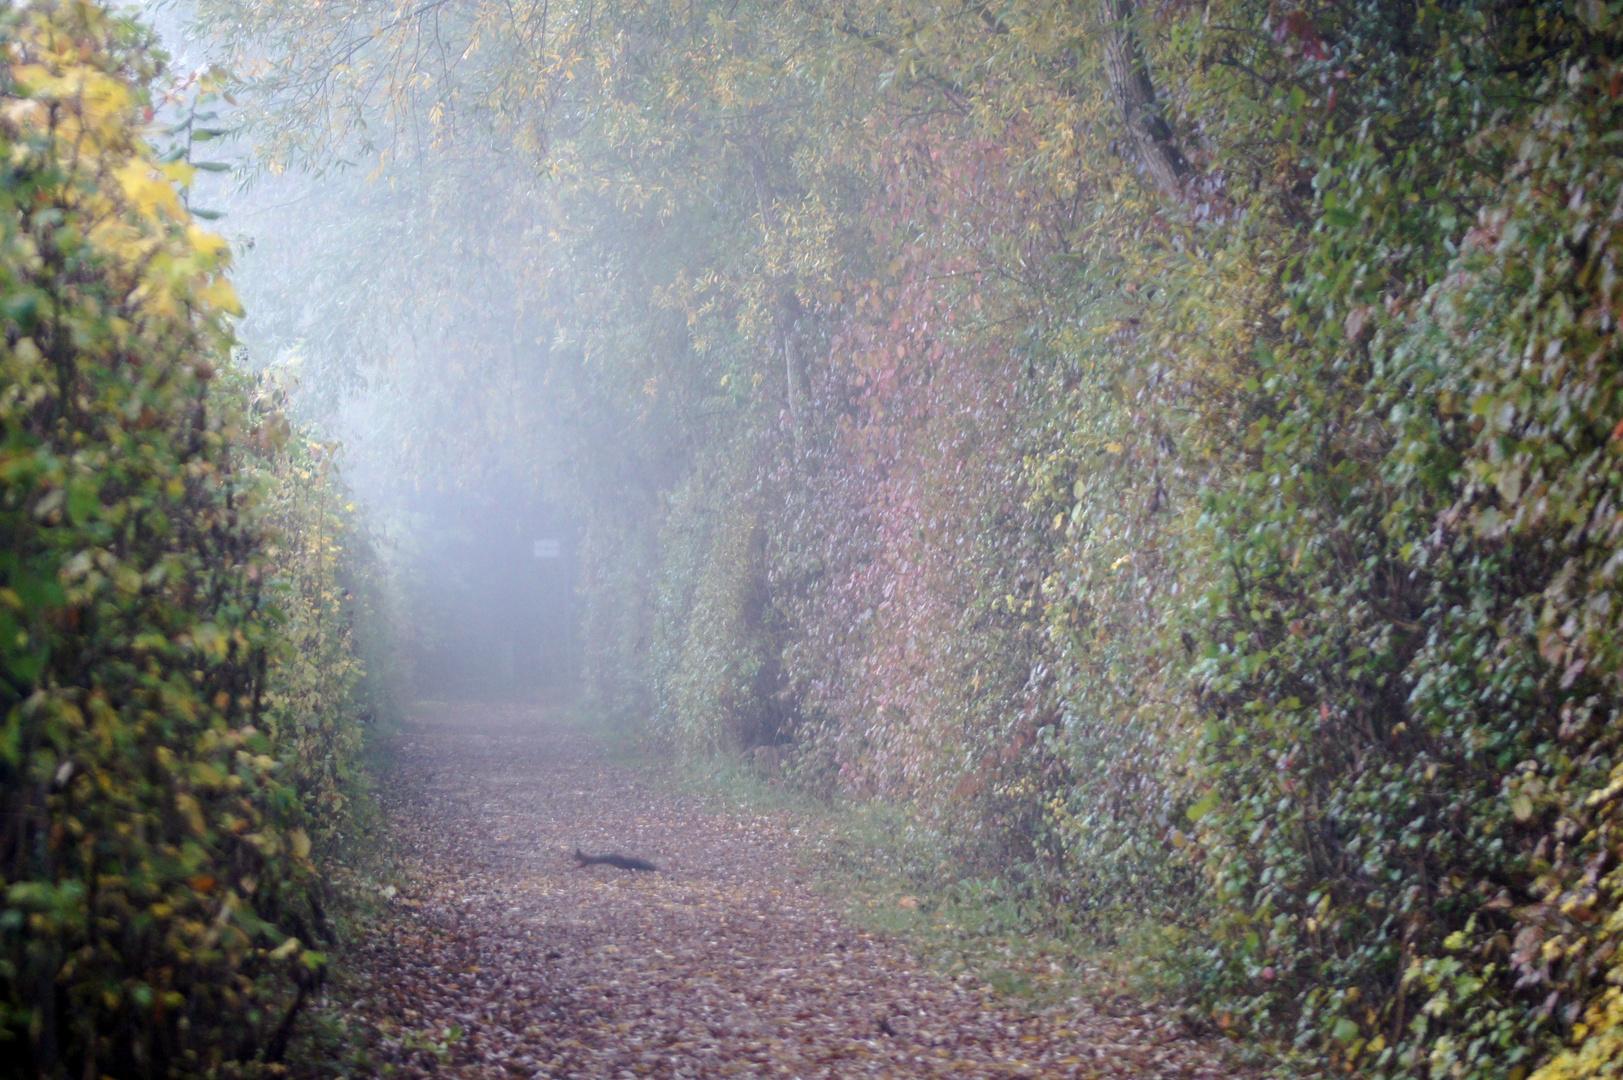 Spaziergang im Morgennebel